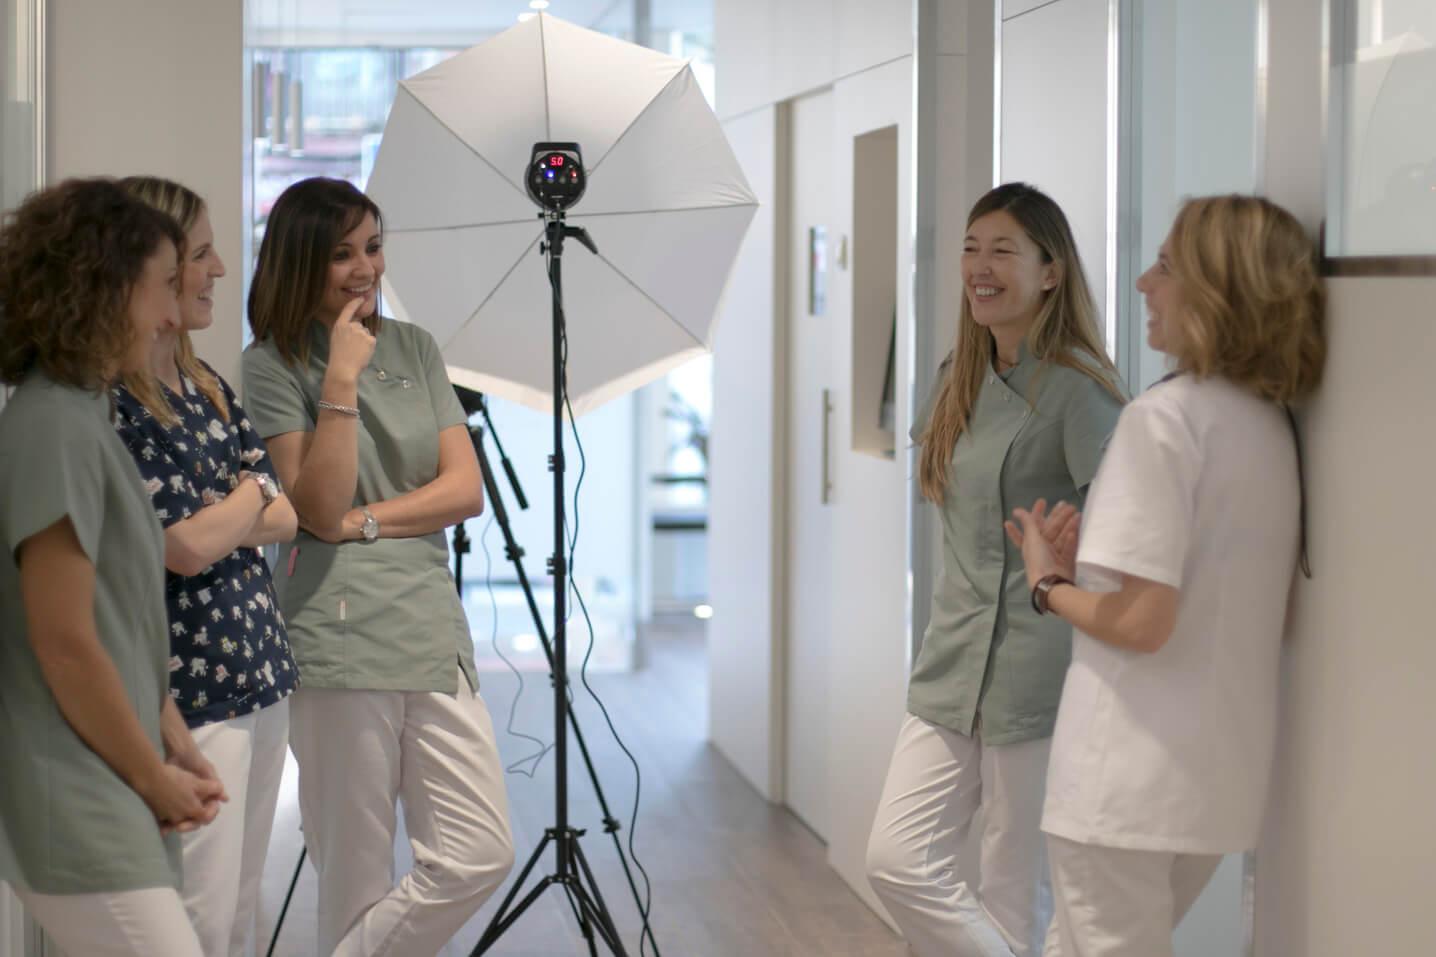 Fotografía Corporativa para clínicas | Docmedia Barcelona